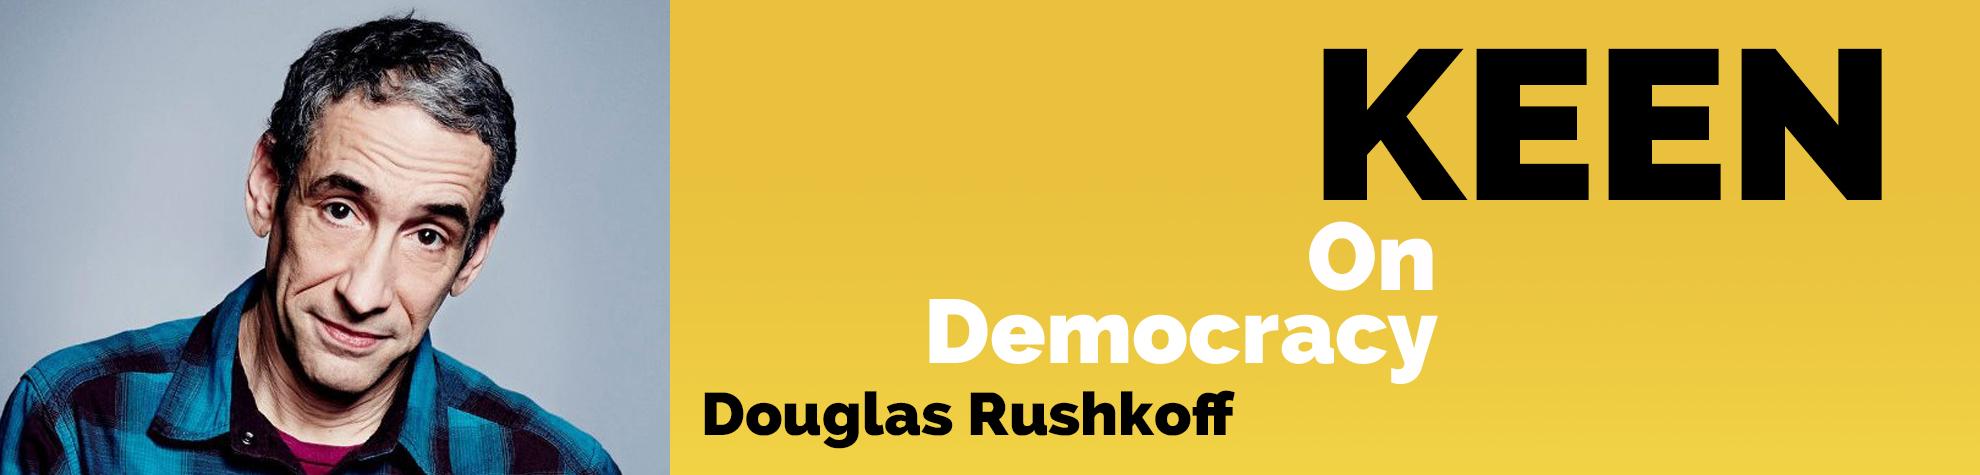 Douglas Rushkoff.jpg